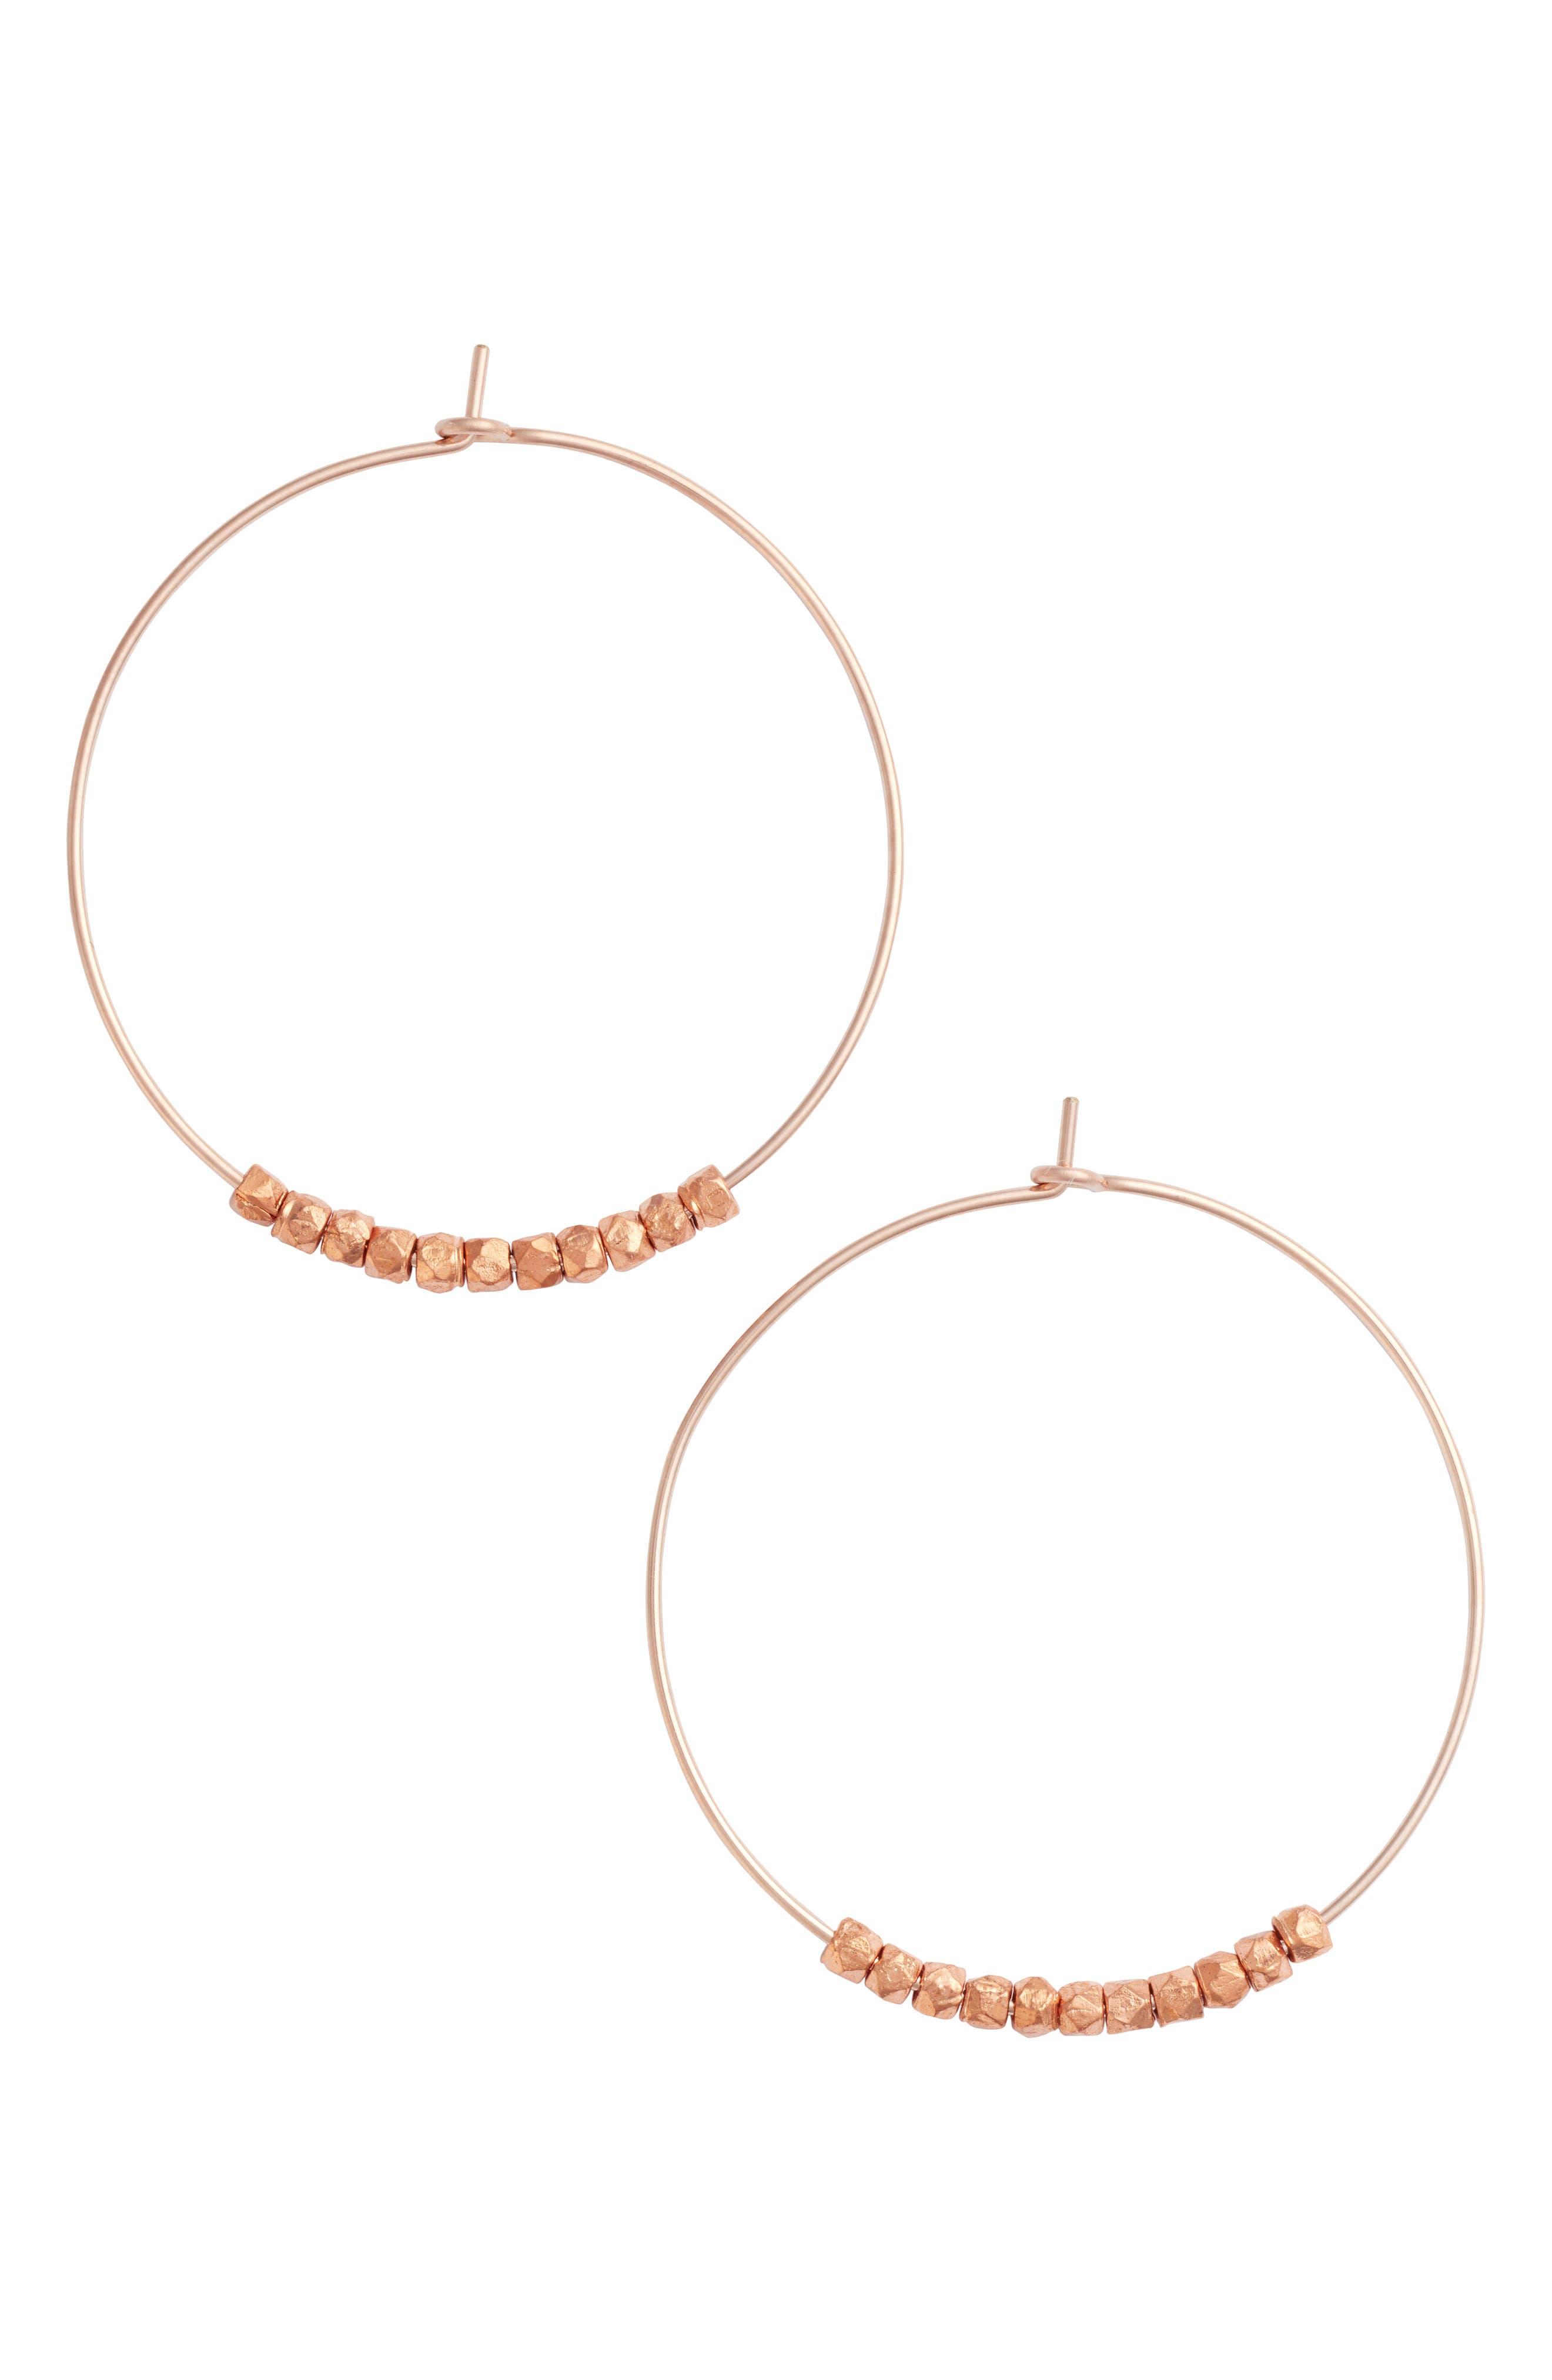 Karly Glistening Hoop Earrings,                         Main,                         color, Rose Gold